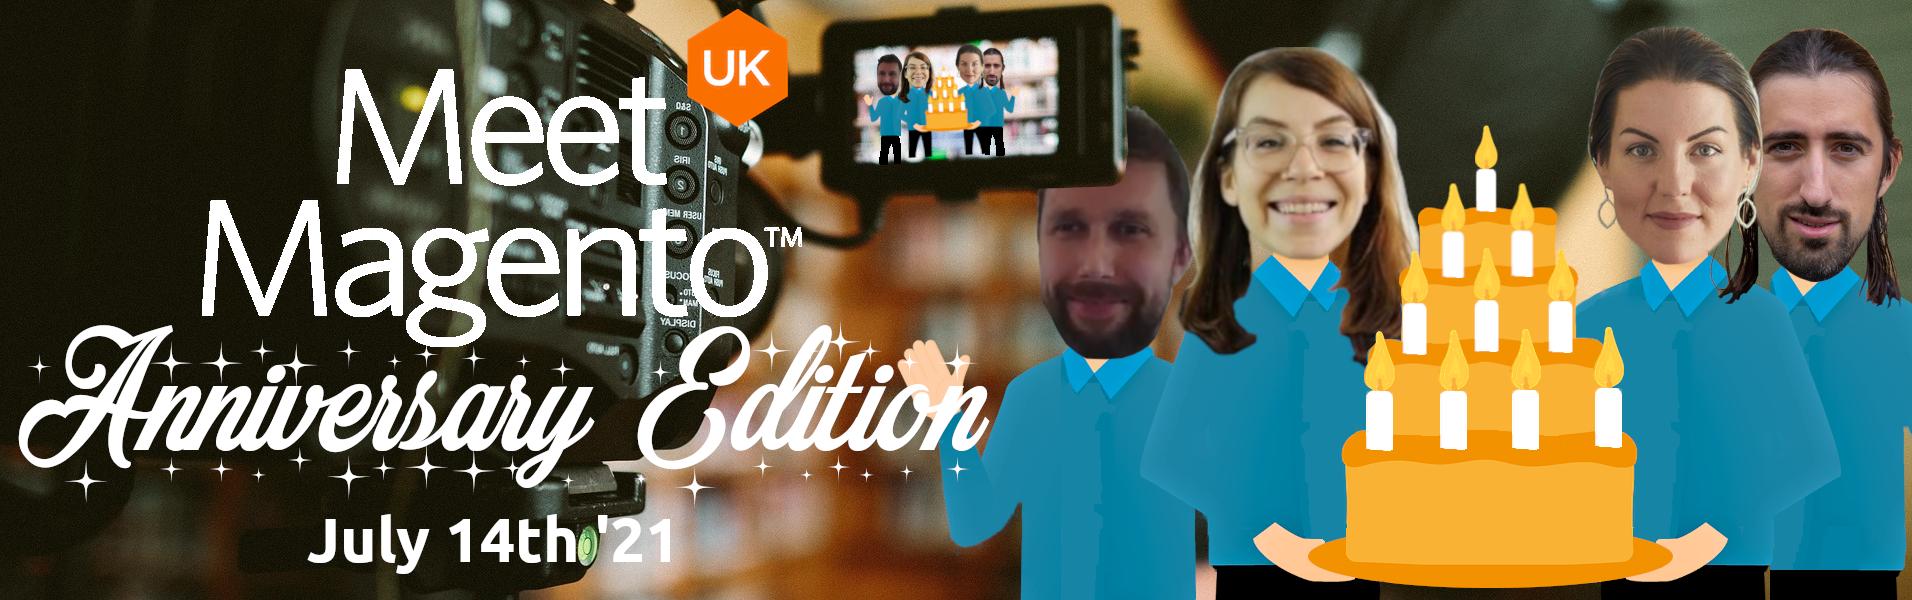 Meet Magento UK '21 - Talia Shani, Polly Lygoe, Oleksandr Lyzun & Russell Flawn